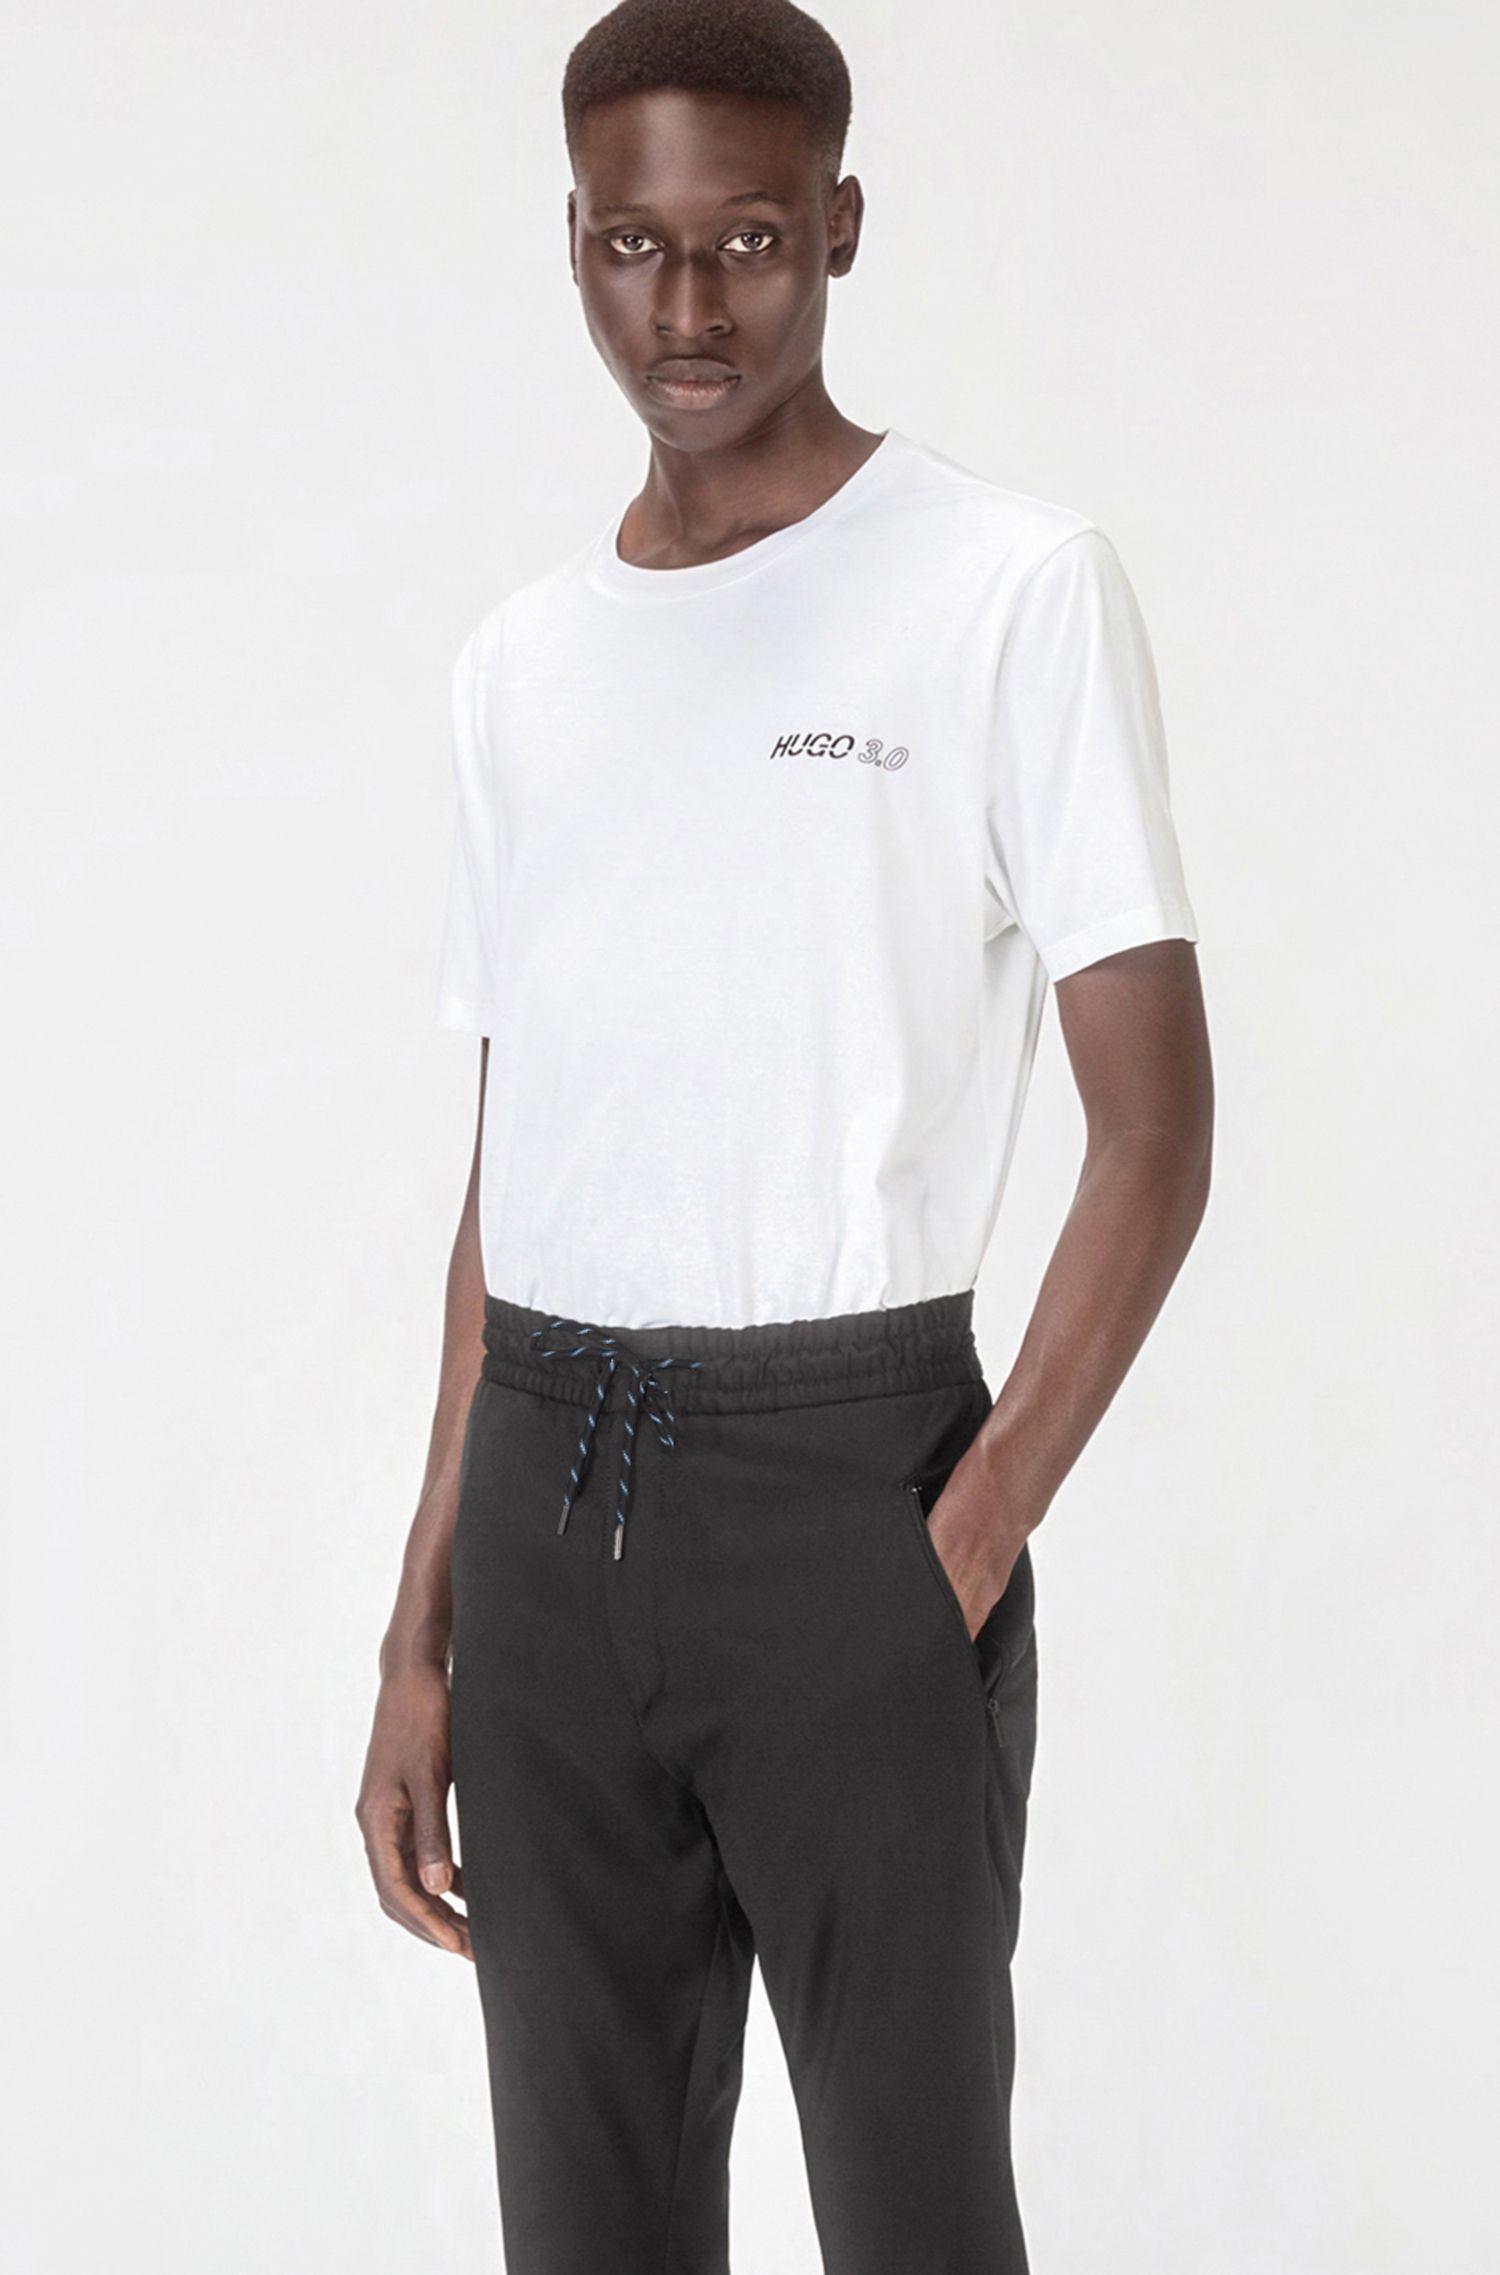 Pantaloni con coulisse tapered fit in lana vergine della capsule Bits & Bites, Nero